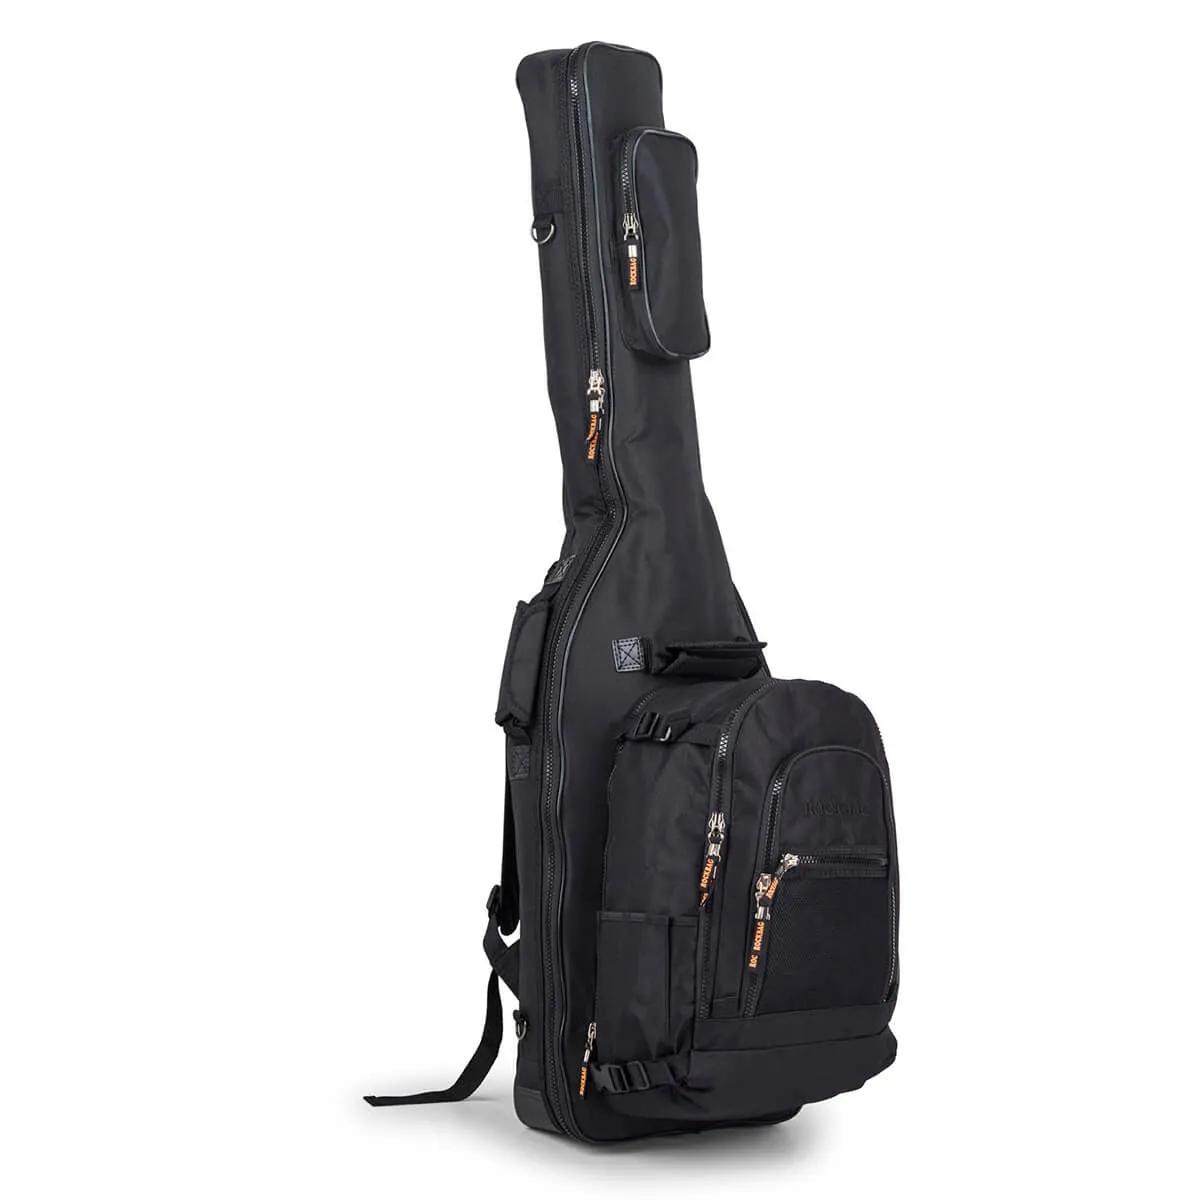 Bag Capa Rockbag RB20455 B Crosswalker C/ Mochila para baixo